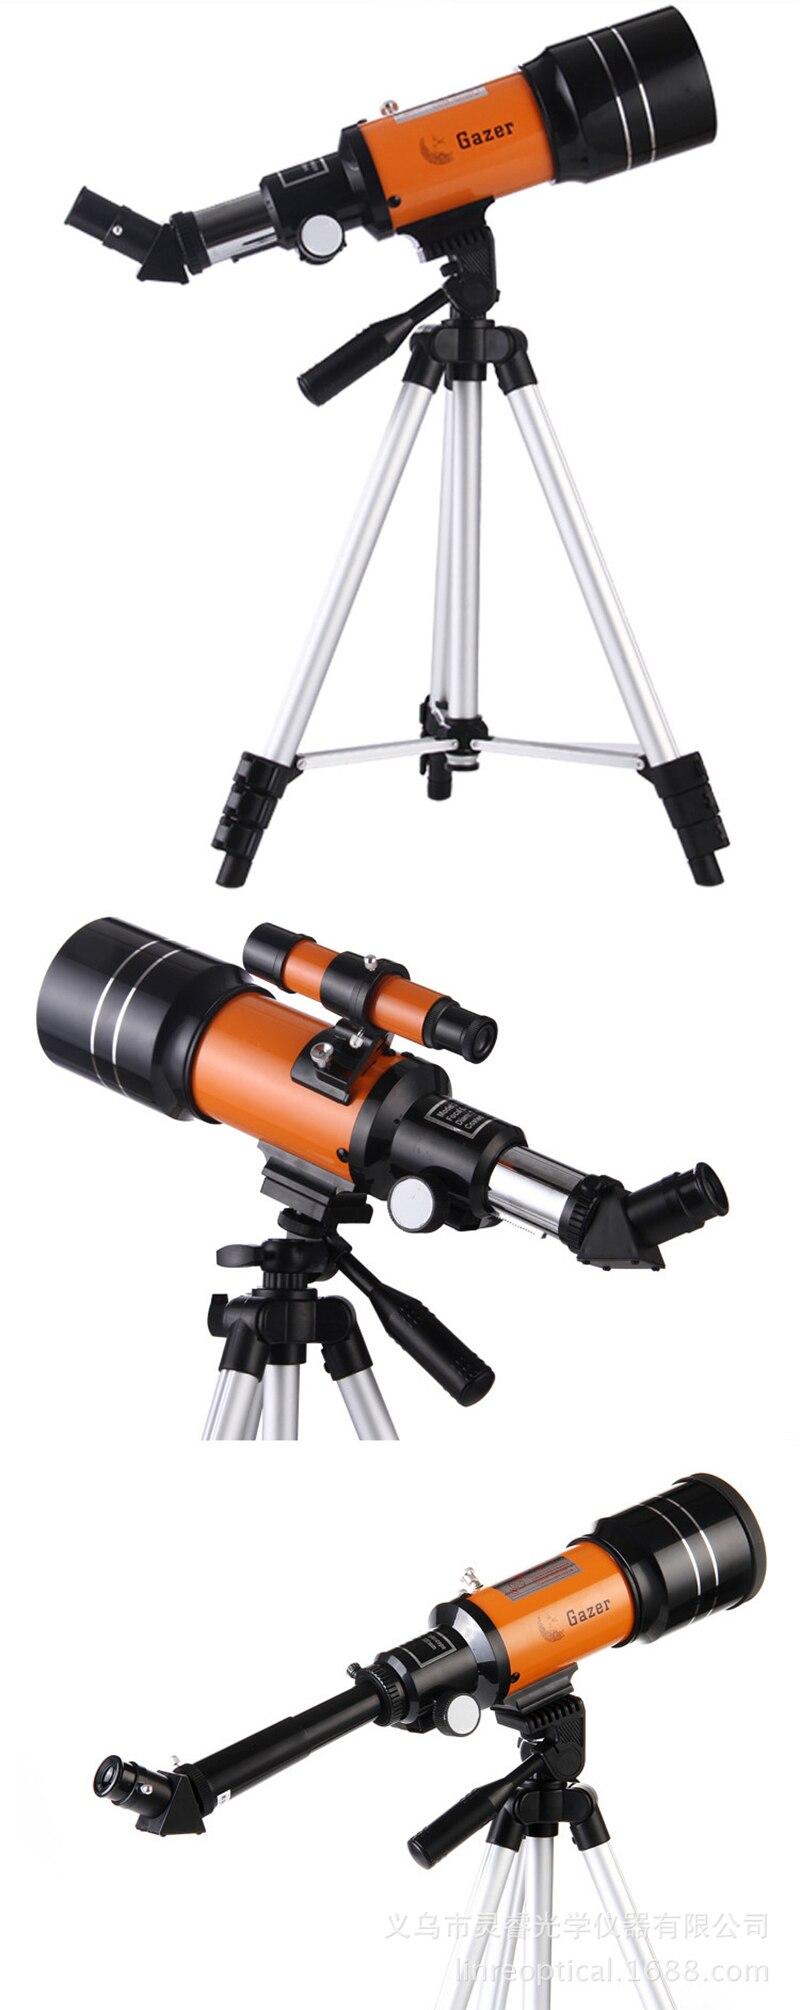 profundo vista estrela lua 1000 telescópio monocular